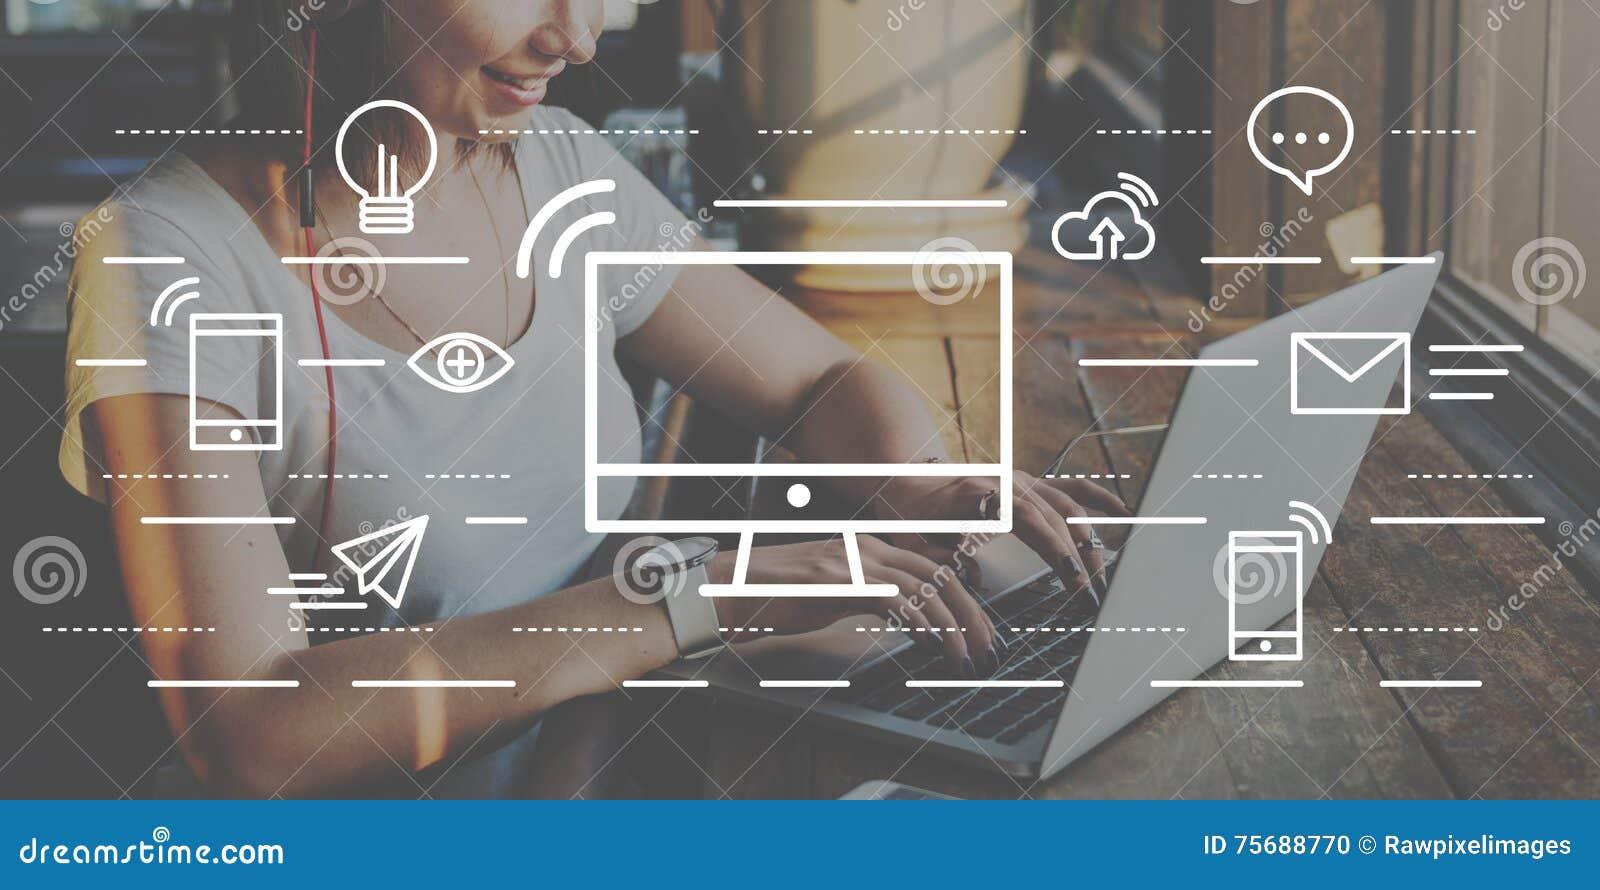 Computer-Kommunikations-Verbindungs-Technologie-Informations-Konzept